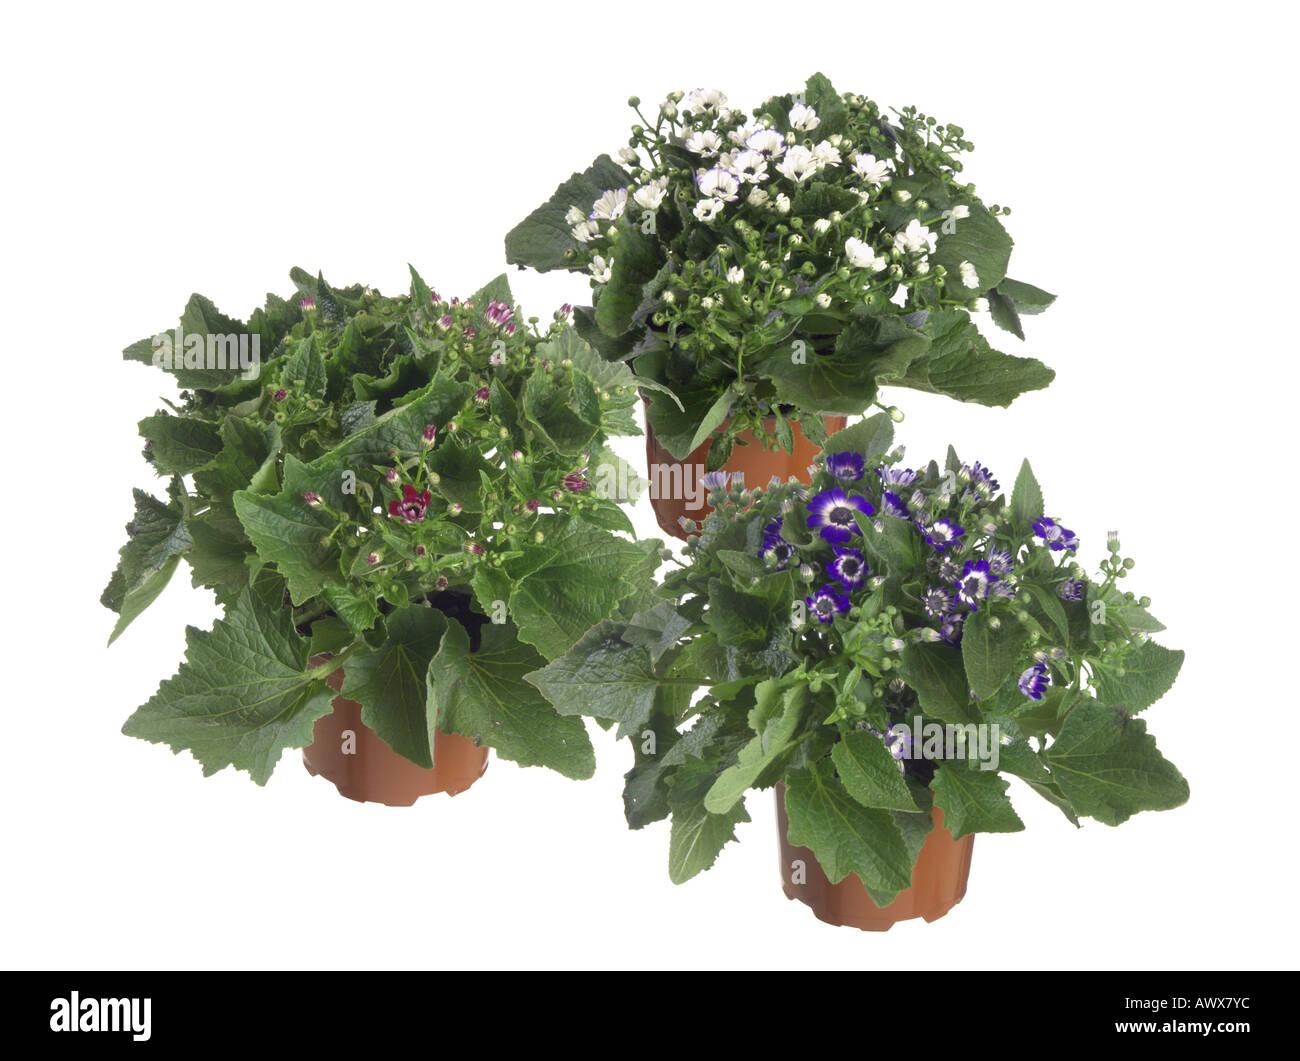 Cineraria, Common Ragwort (Pericallis x hybrida, Pericallis hybrida, Senecio x hybridus, Senecio hybridus), potted plant, diffe - Stock Image